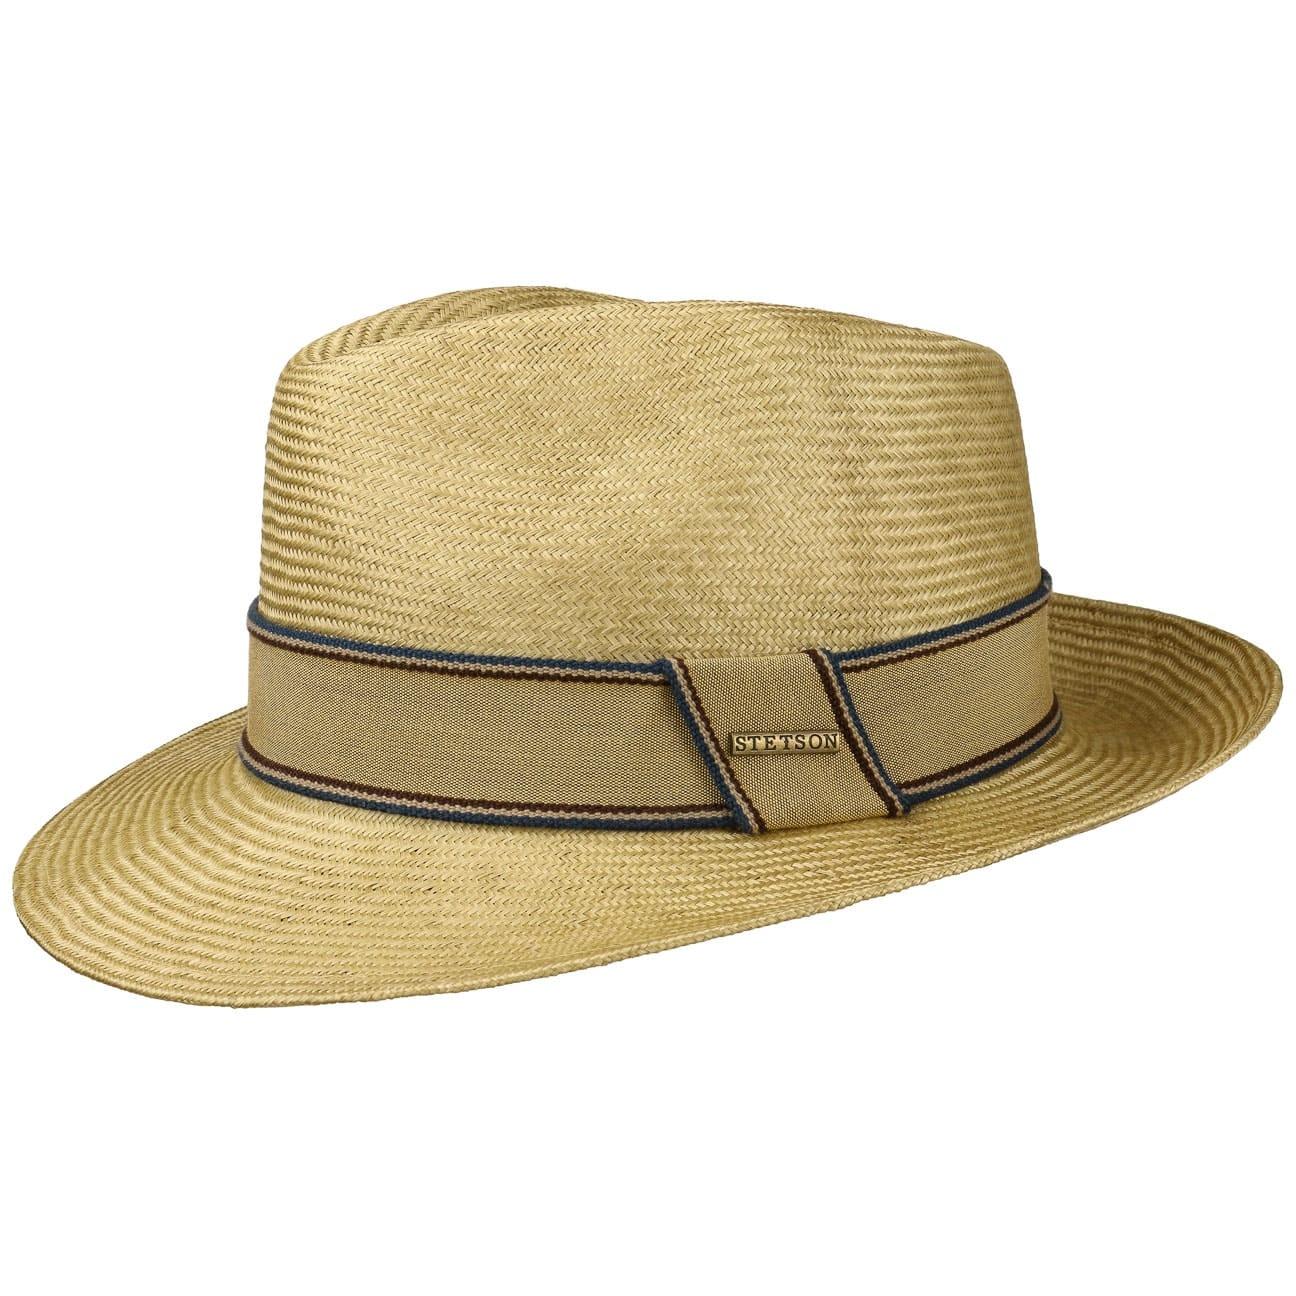 Sombrero Abaca Fedora by Stetson  sombrero de verano